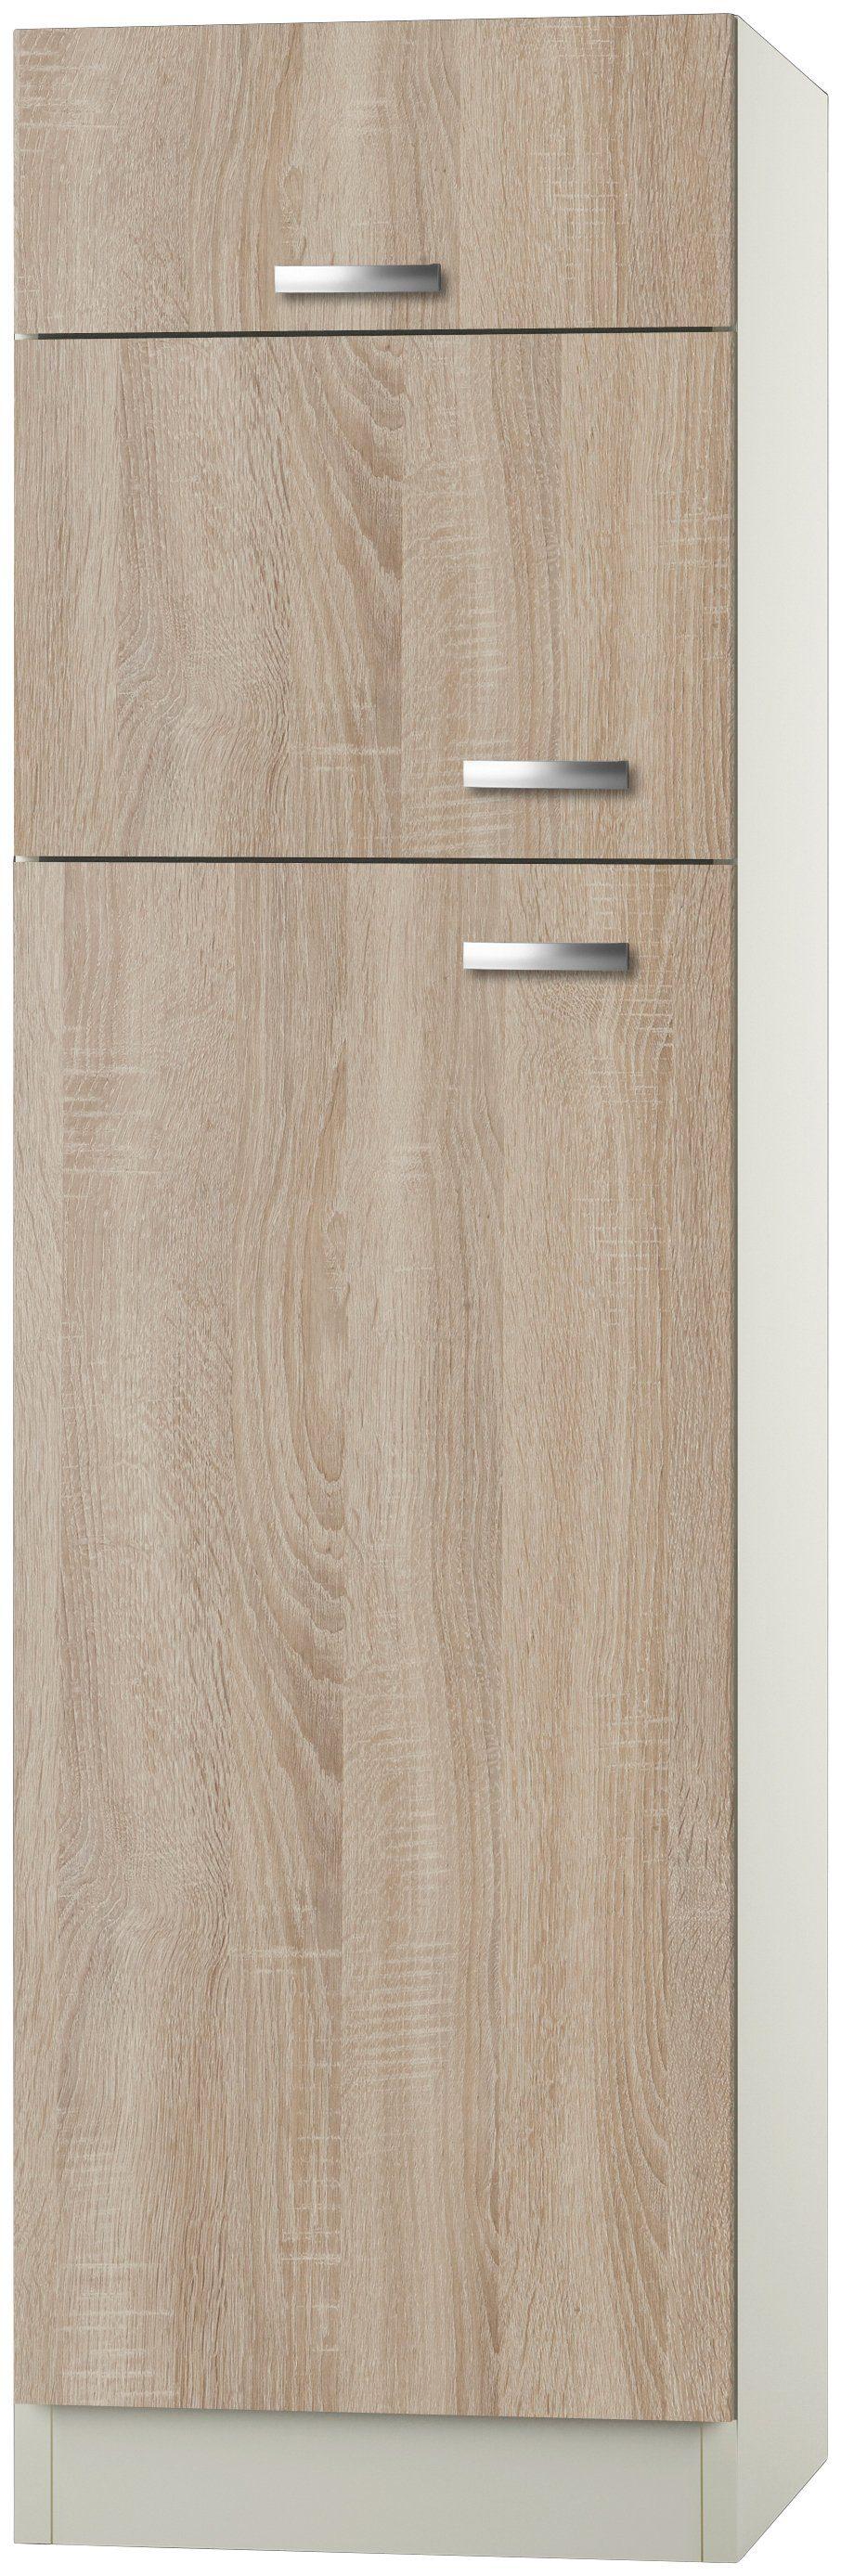 Kühlumbauschrank »Padua, Höhe 206,8 cm«